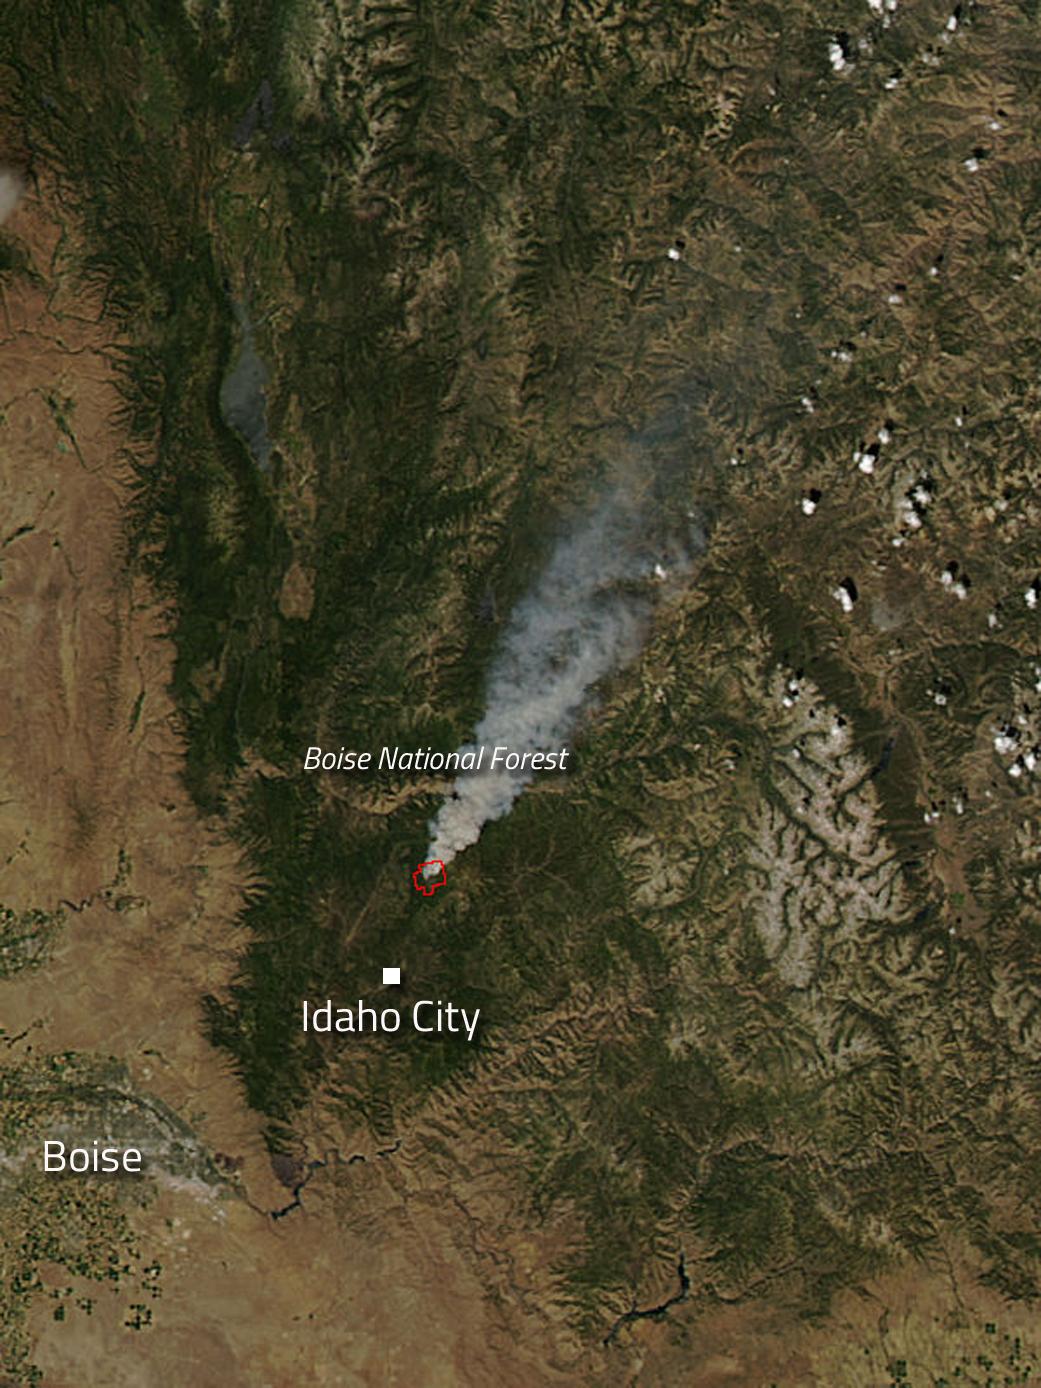 Pioneer Fire in Idaho | NASA on 2013 sun valley idaho map, idaho soils map, fires in idaho map, new mexico wildfire map, idaho wildfire updates, idaho wildfire report, idaho fire map 2013, idaho california map, idaho fires burning, wa wildfire map, soda fire idaho map, idaho snow map, idaho heat map, alberta wildfire map, idaho fire updates, united states wildfire map, idaho map with cities, idaho public health map, idaho volcanoes map, idaho flood map,